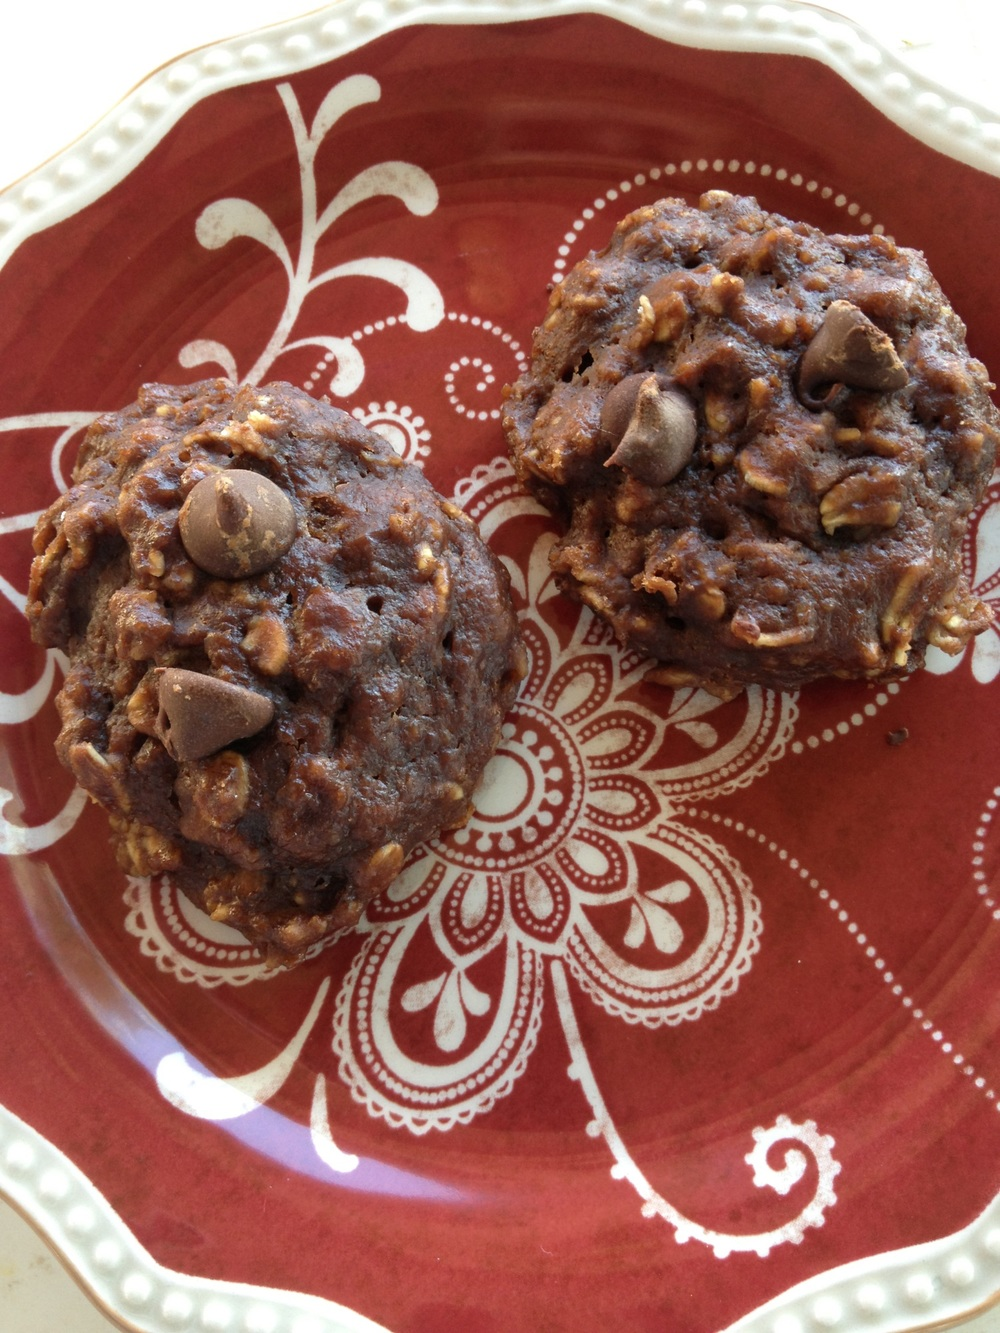 Little monkeys love these cookies!